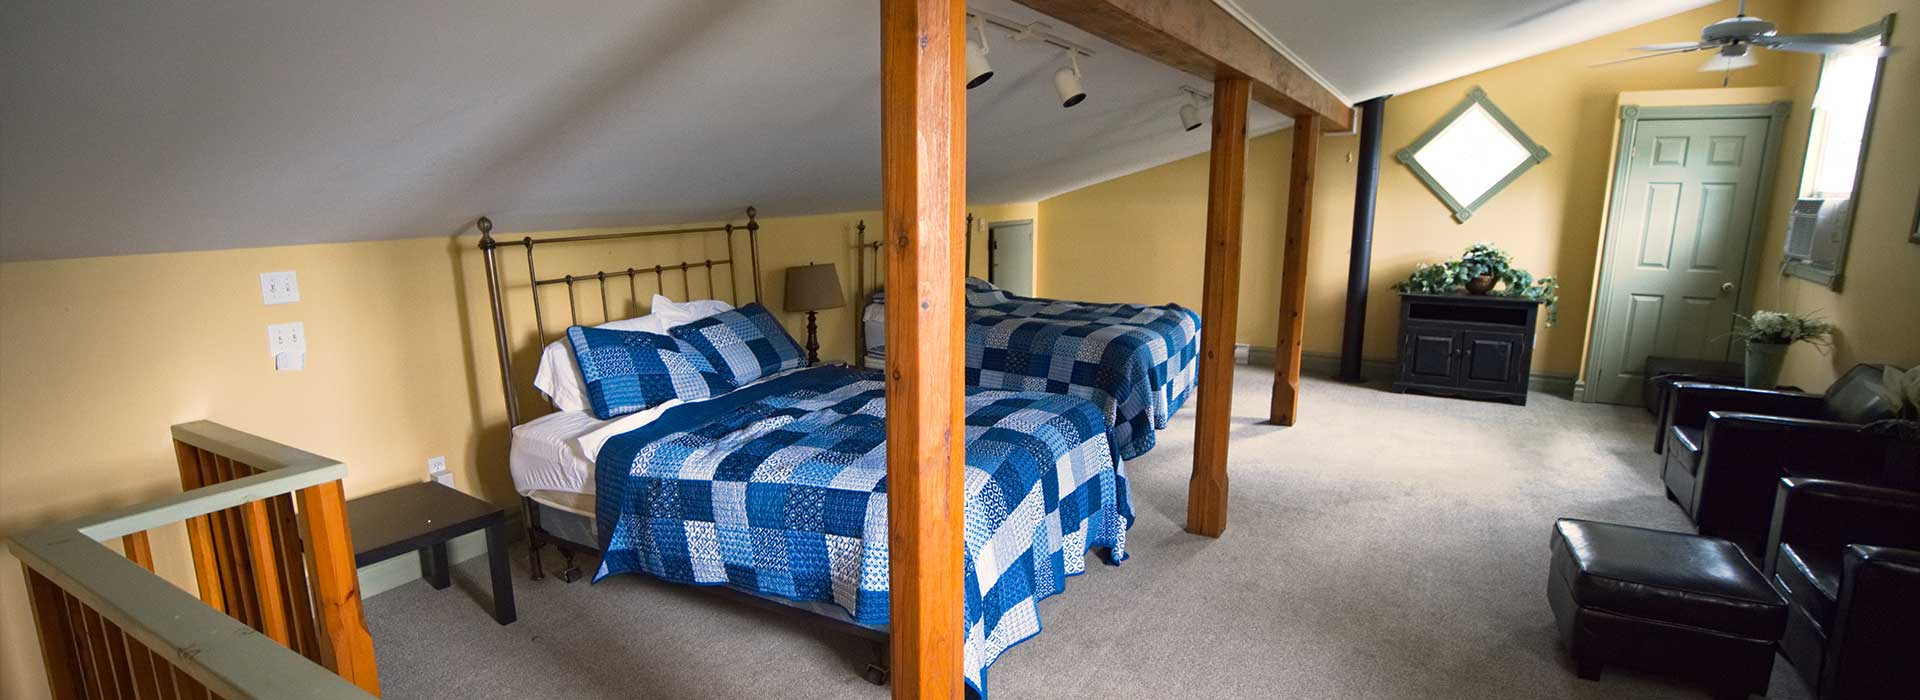 London House Main Bedroom